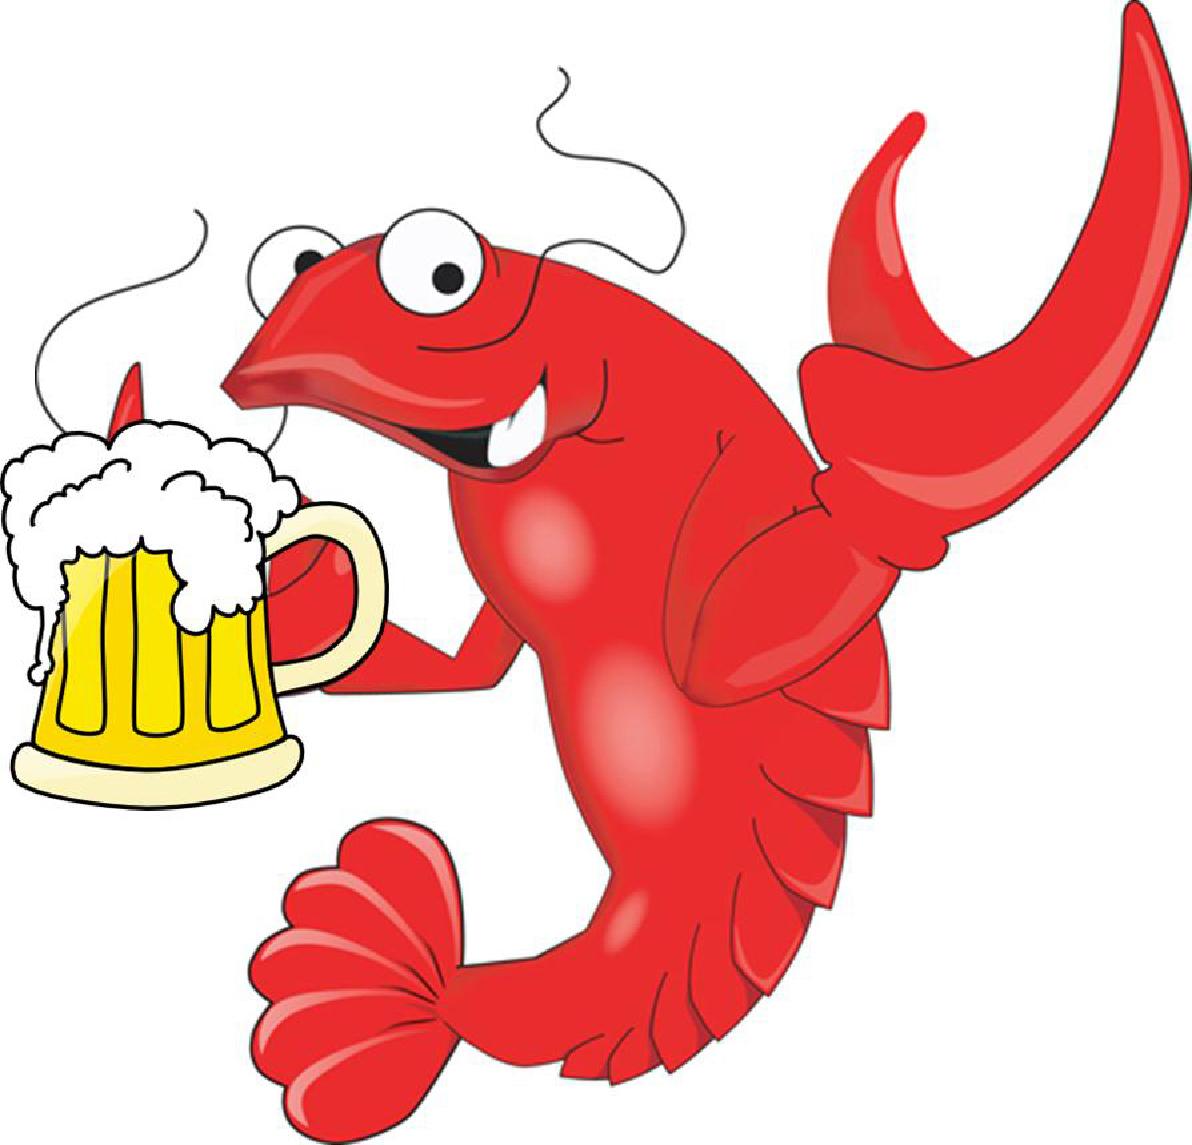 Crawfish Clipart. Crawfish Cliparts-Crawfish Clipart. Crawfish cliparts-11